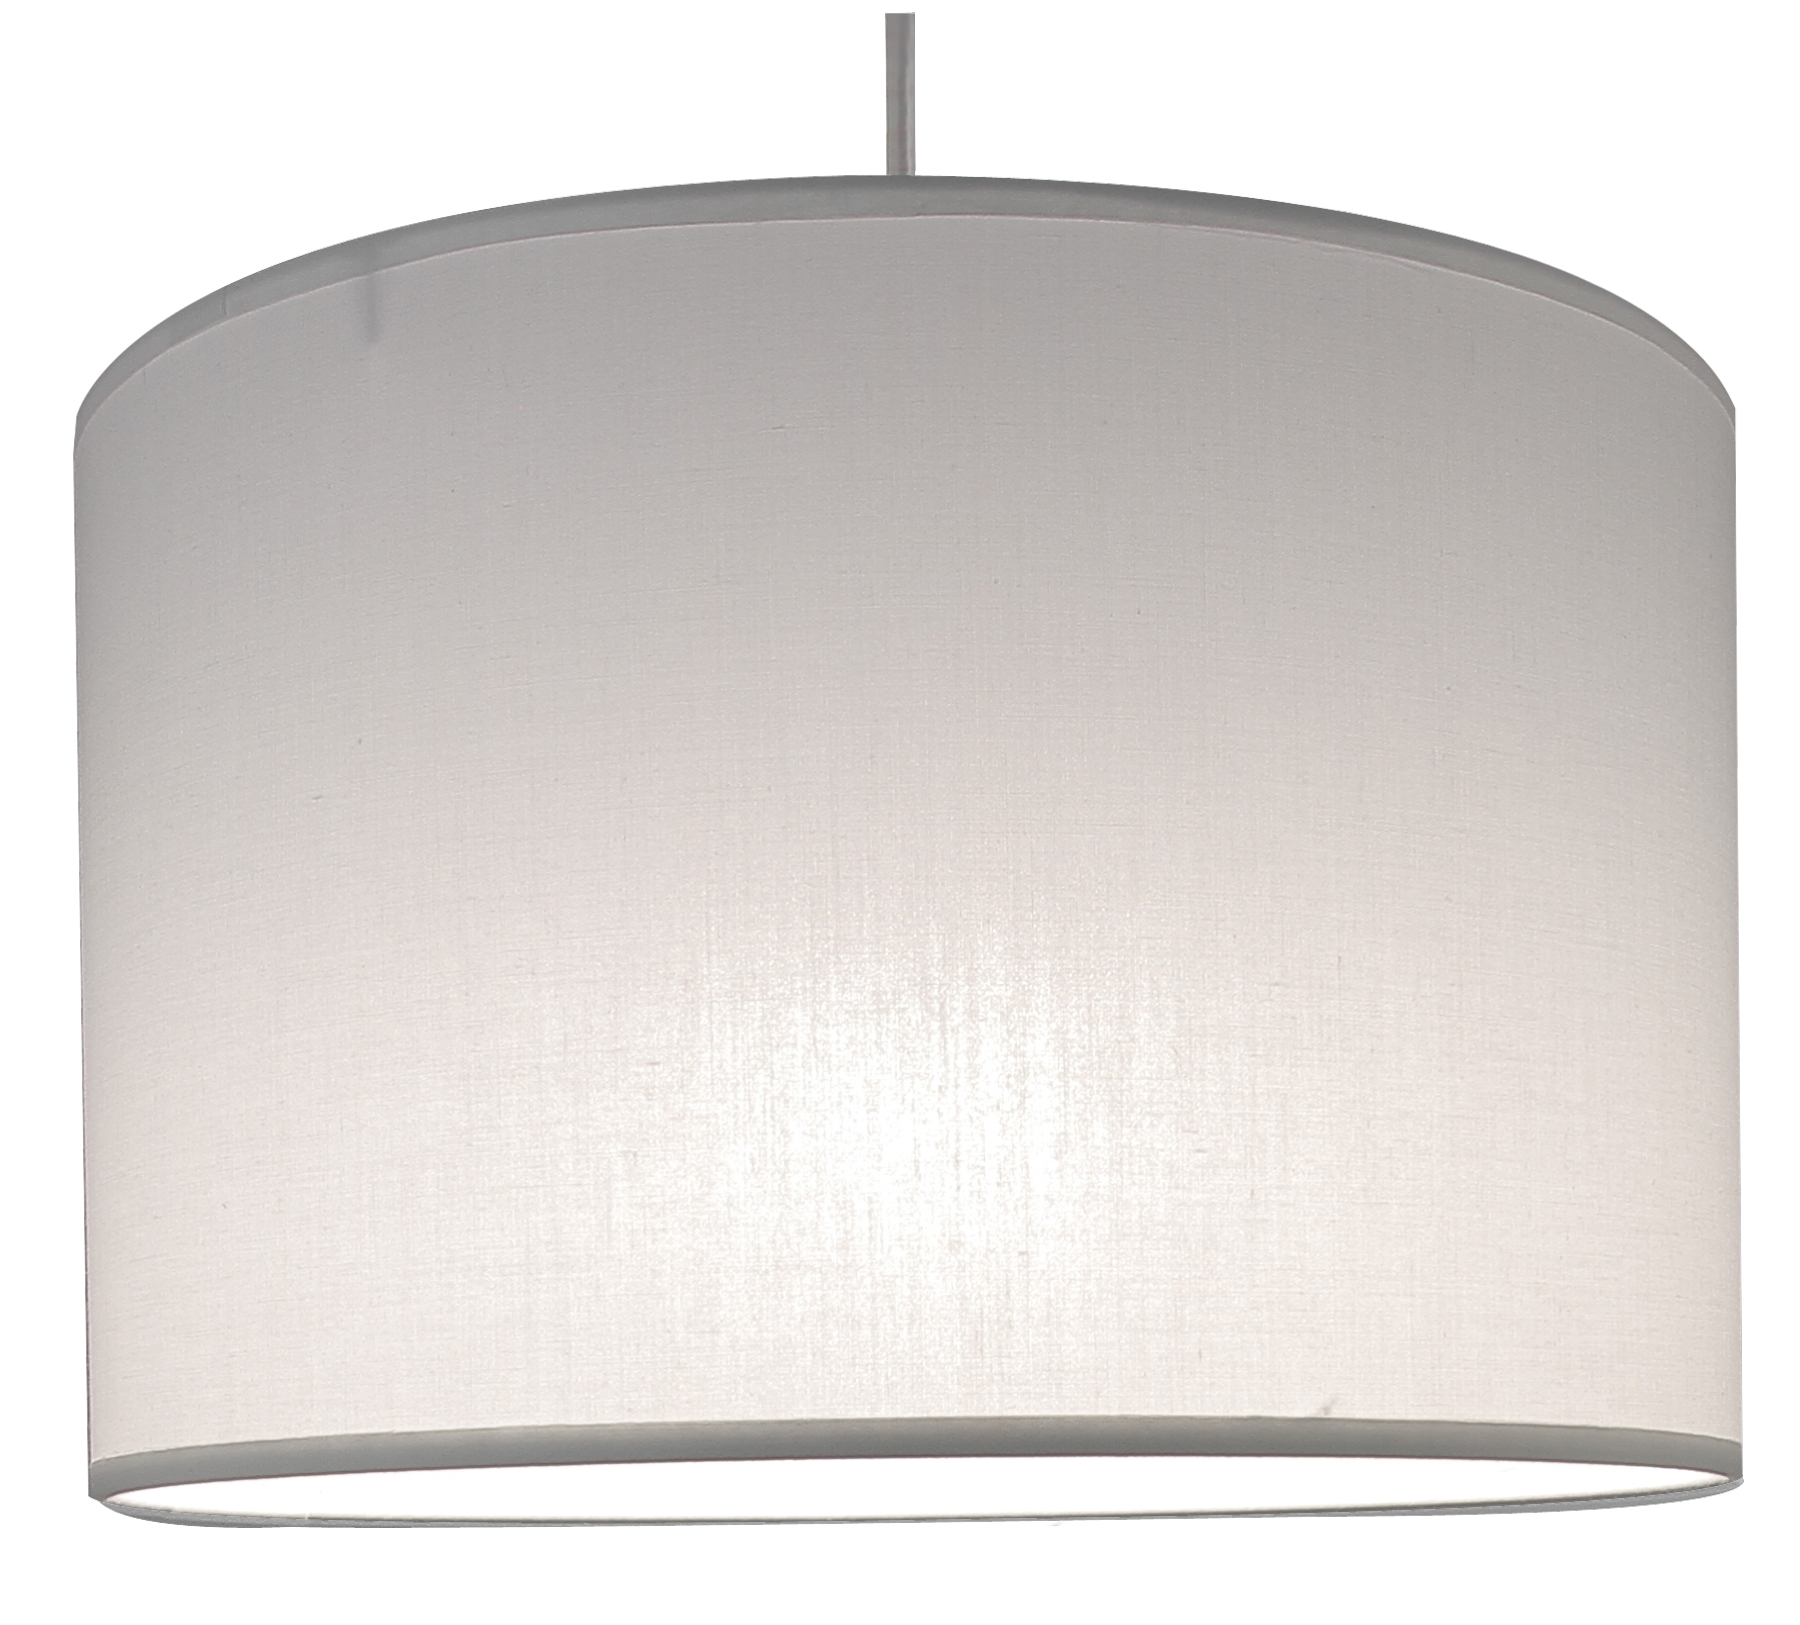 Suspension cylindre blanc transparent, 29 cm